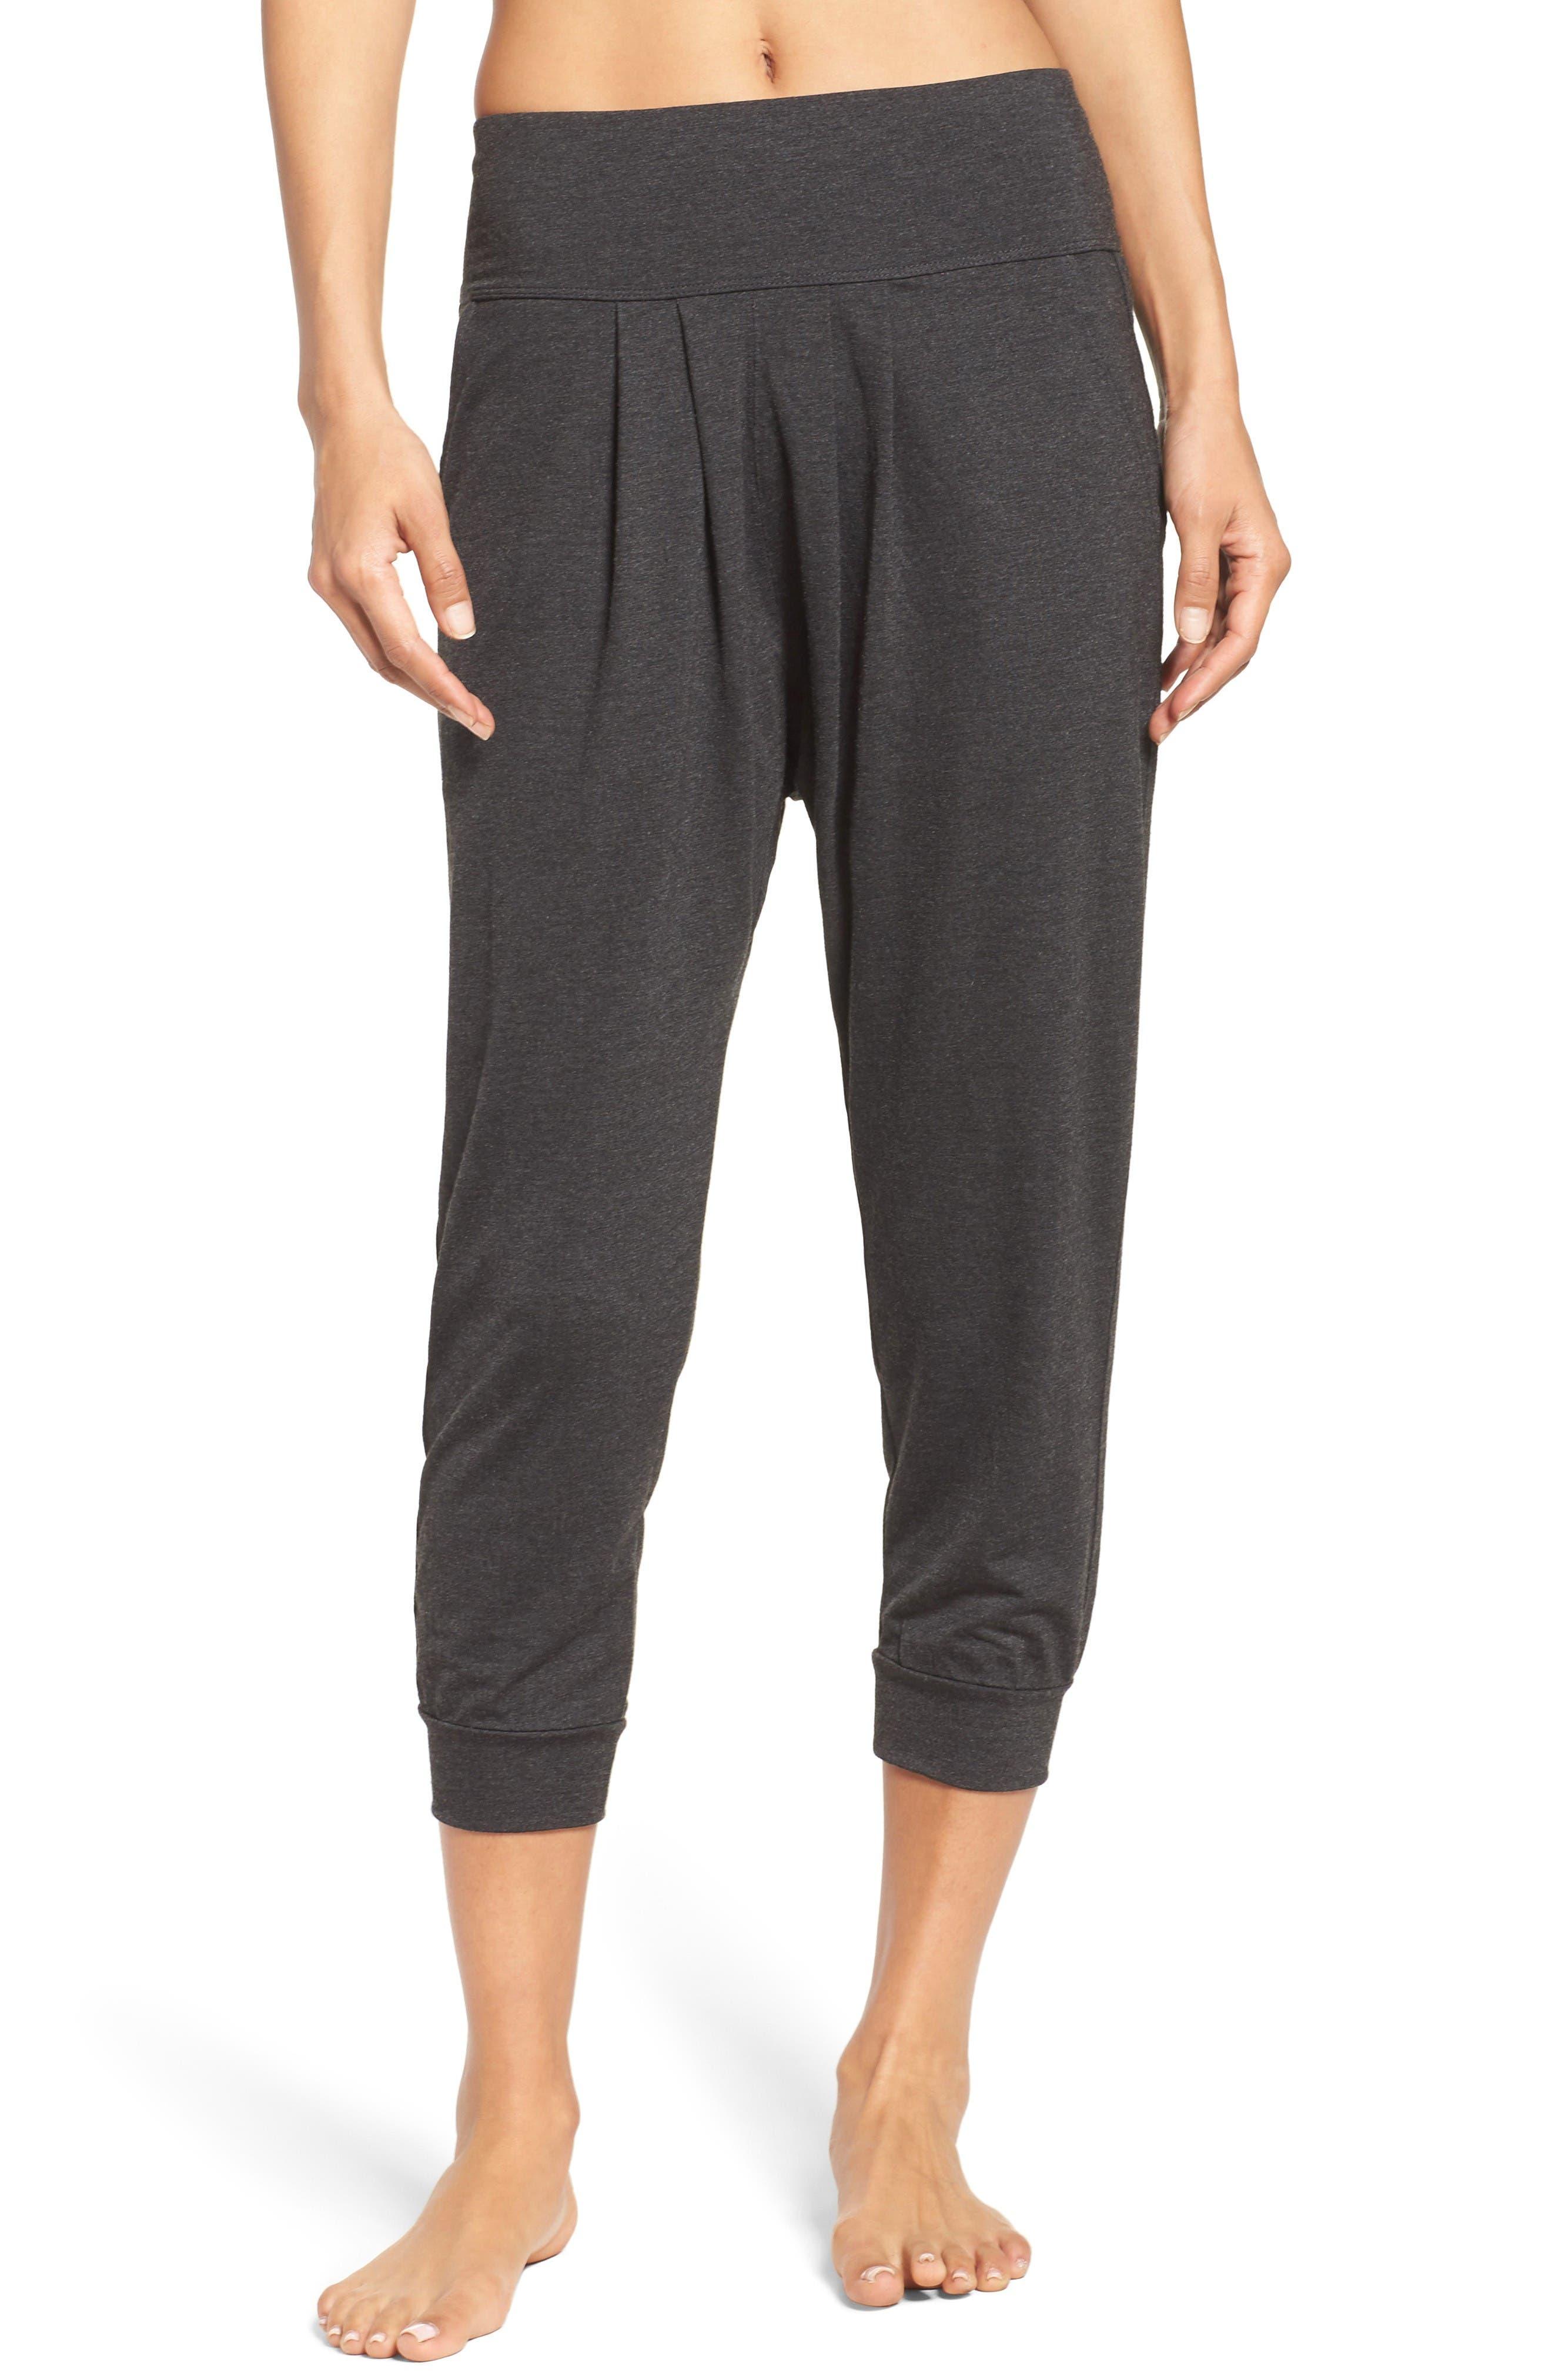 Harmony Crop Harem Pants,                         Main,                         color, Grey Dark Charcoal Heather